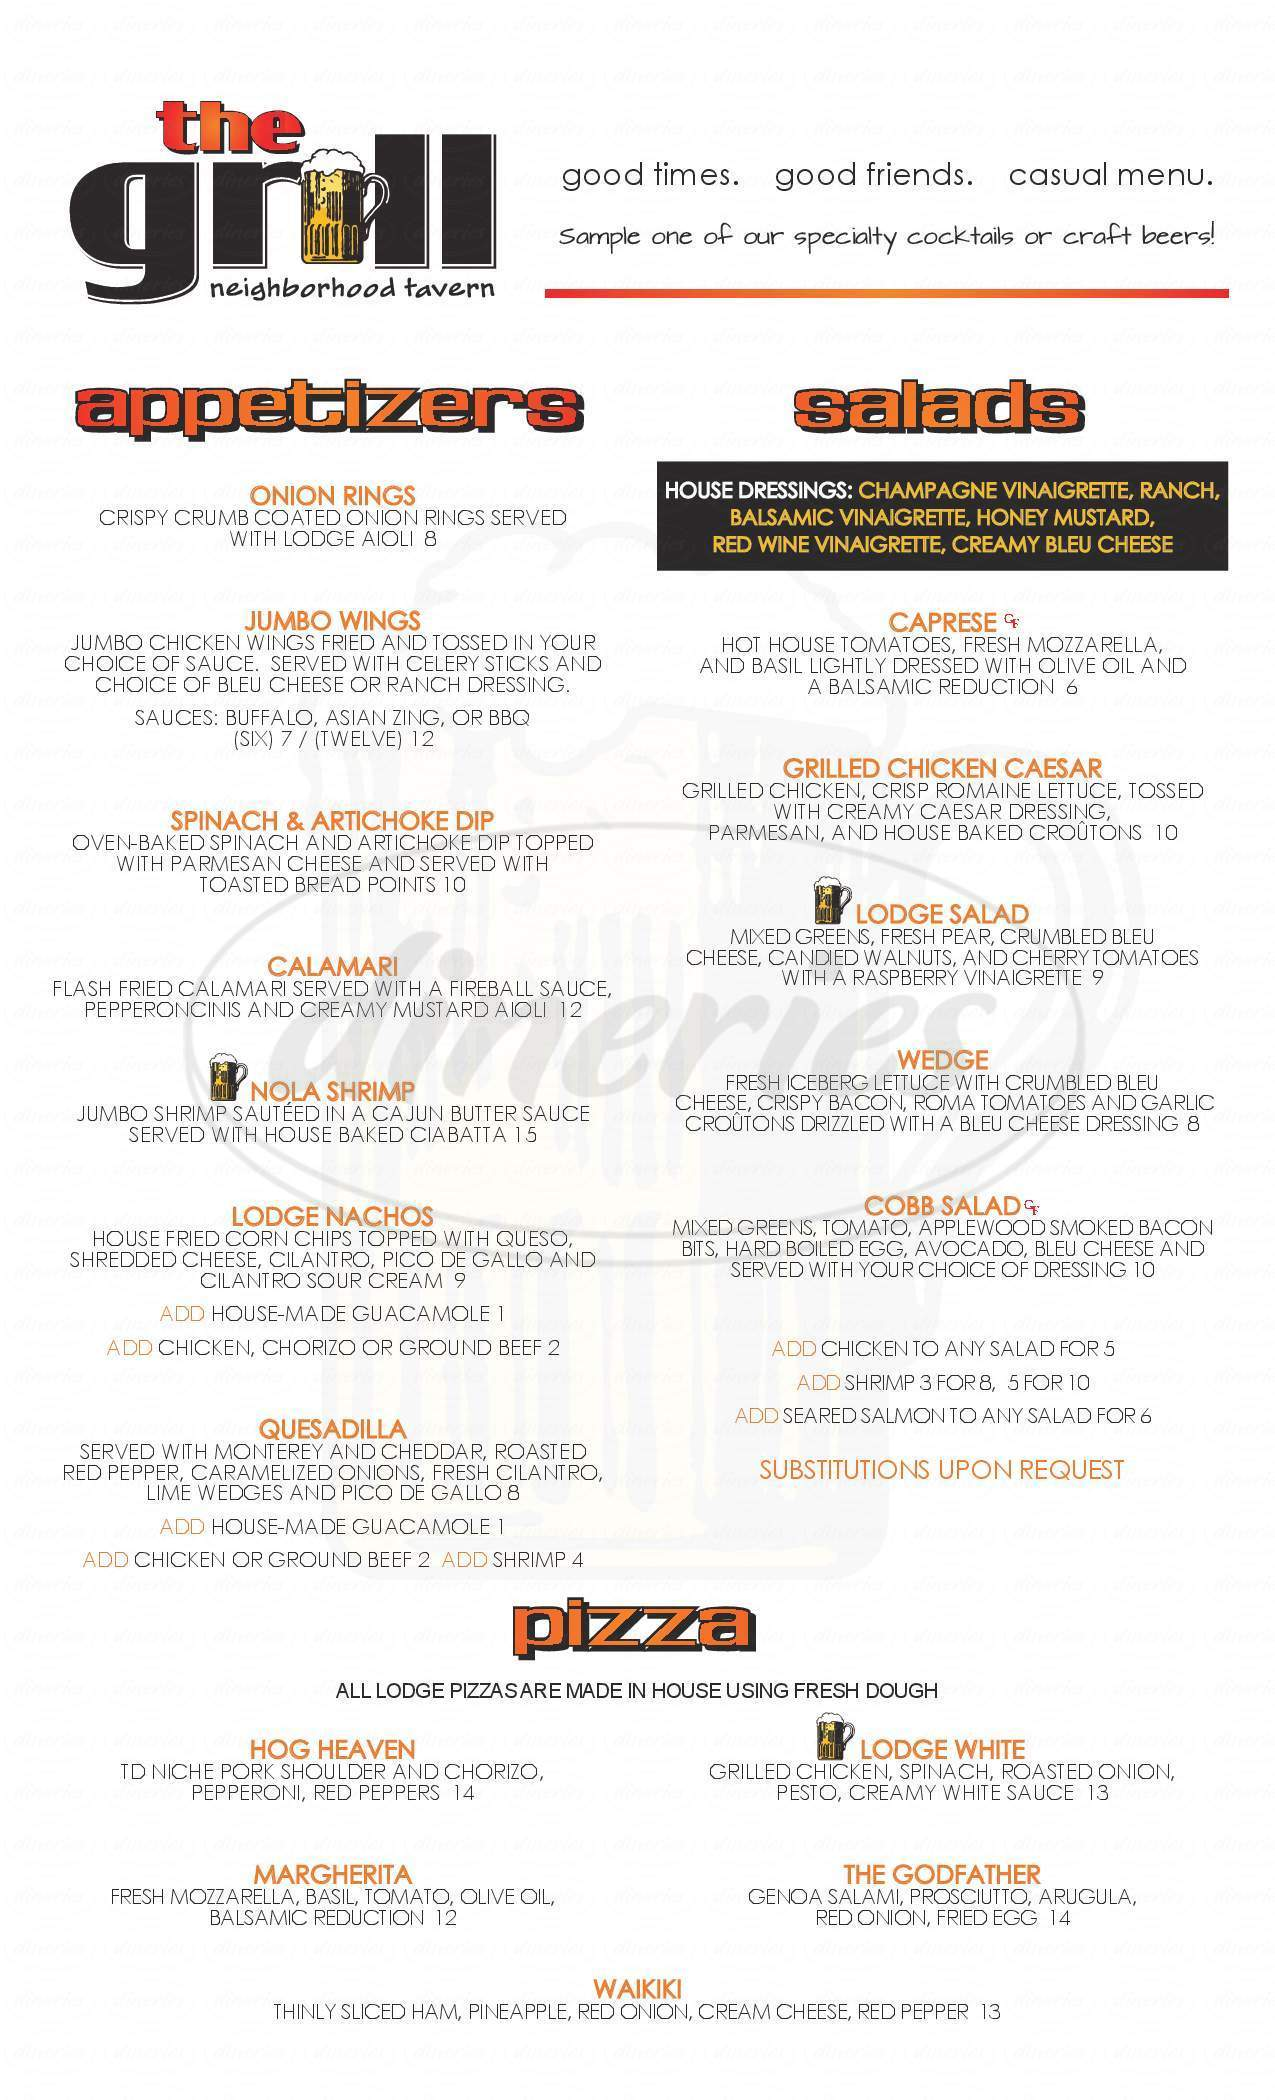 menu for The Lodge at Wilderness Ridge